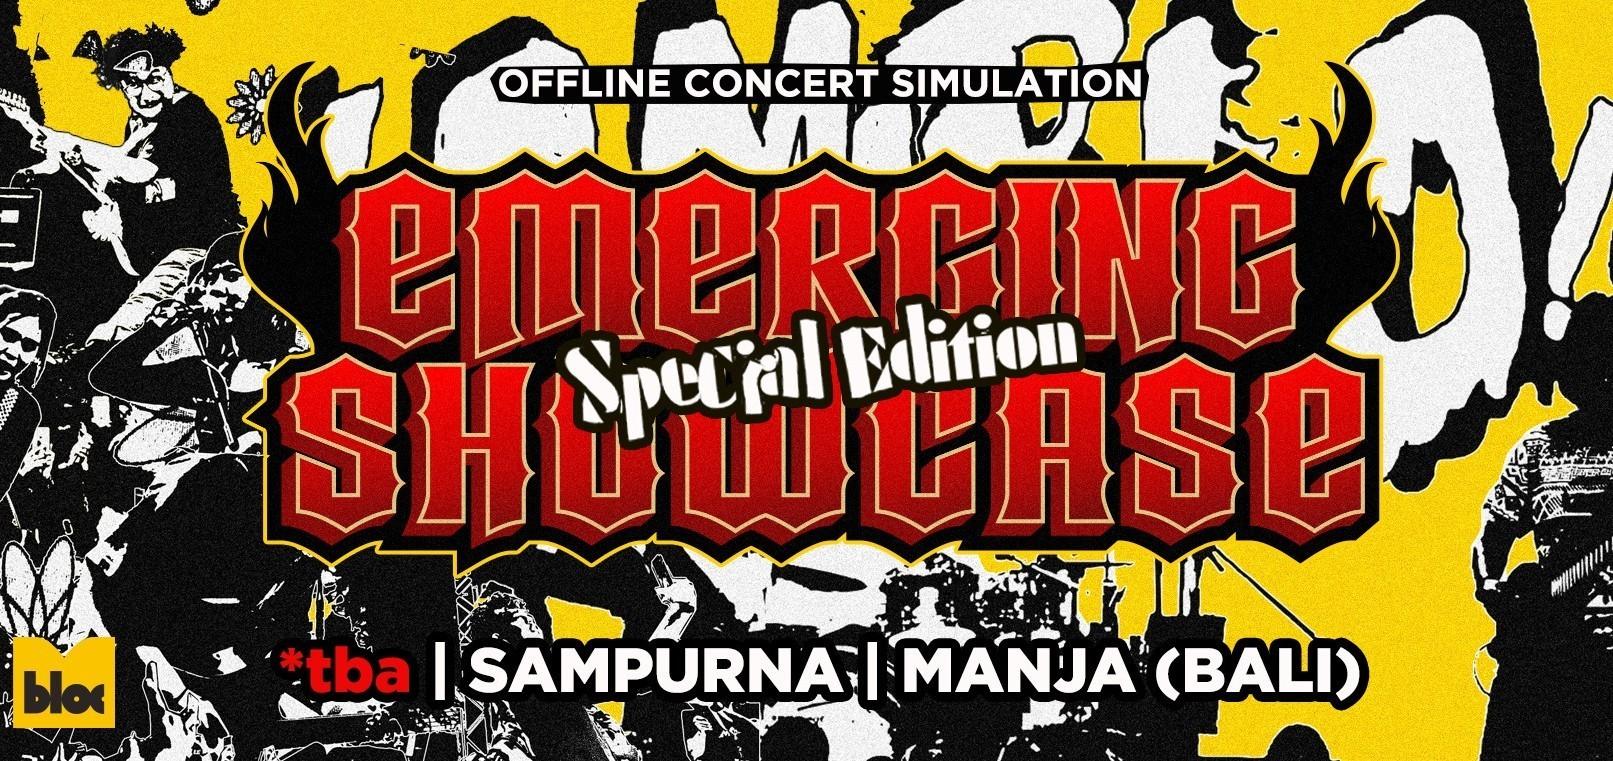 Offline Concert Simulation: Emerging Showcase - Special Edition [SAMPURNA]